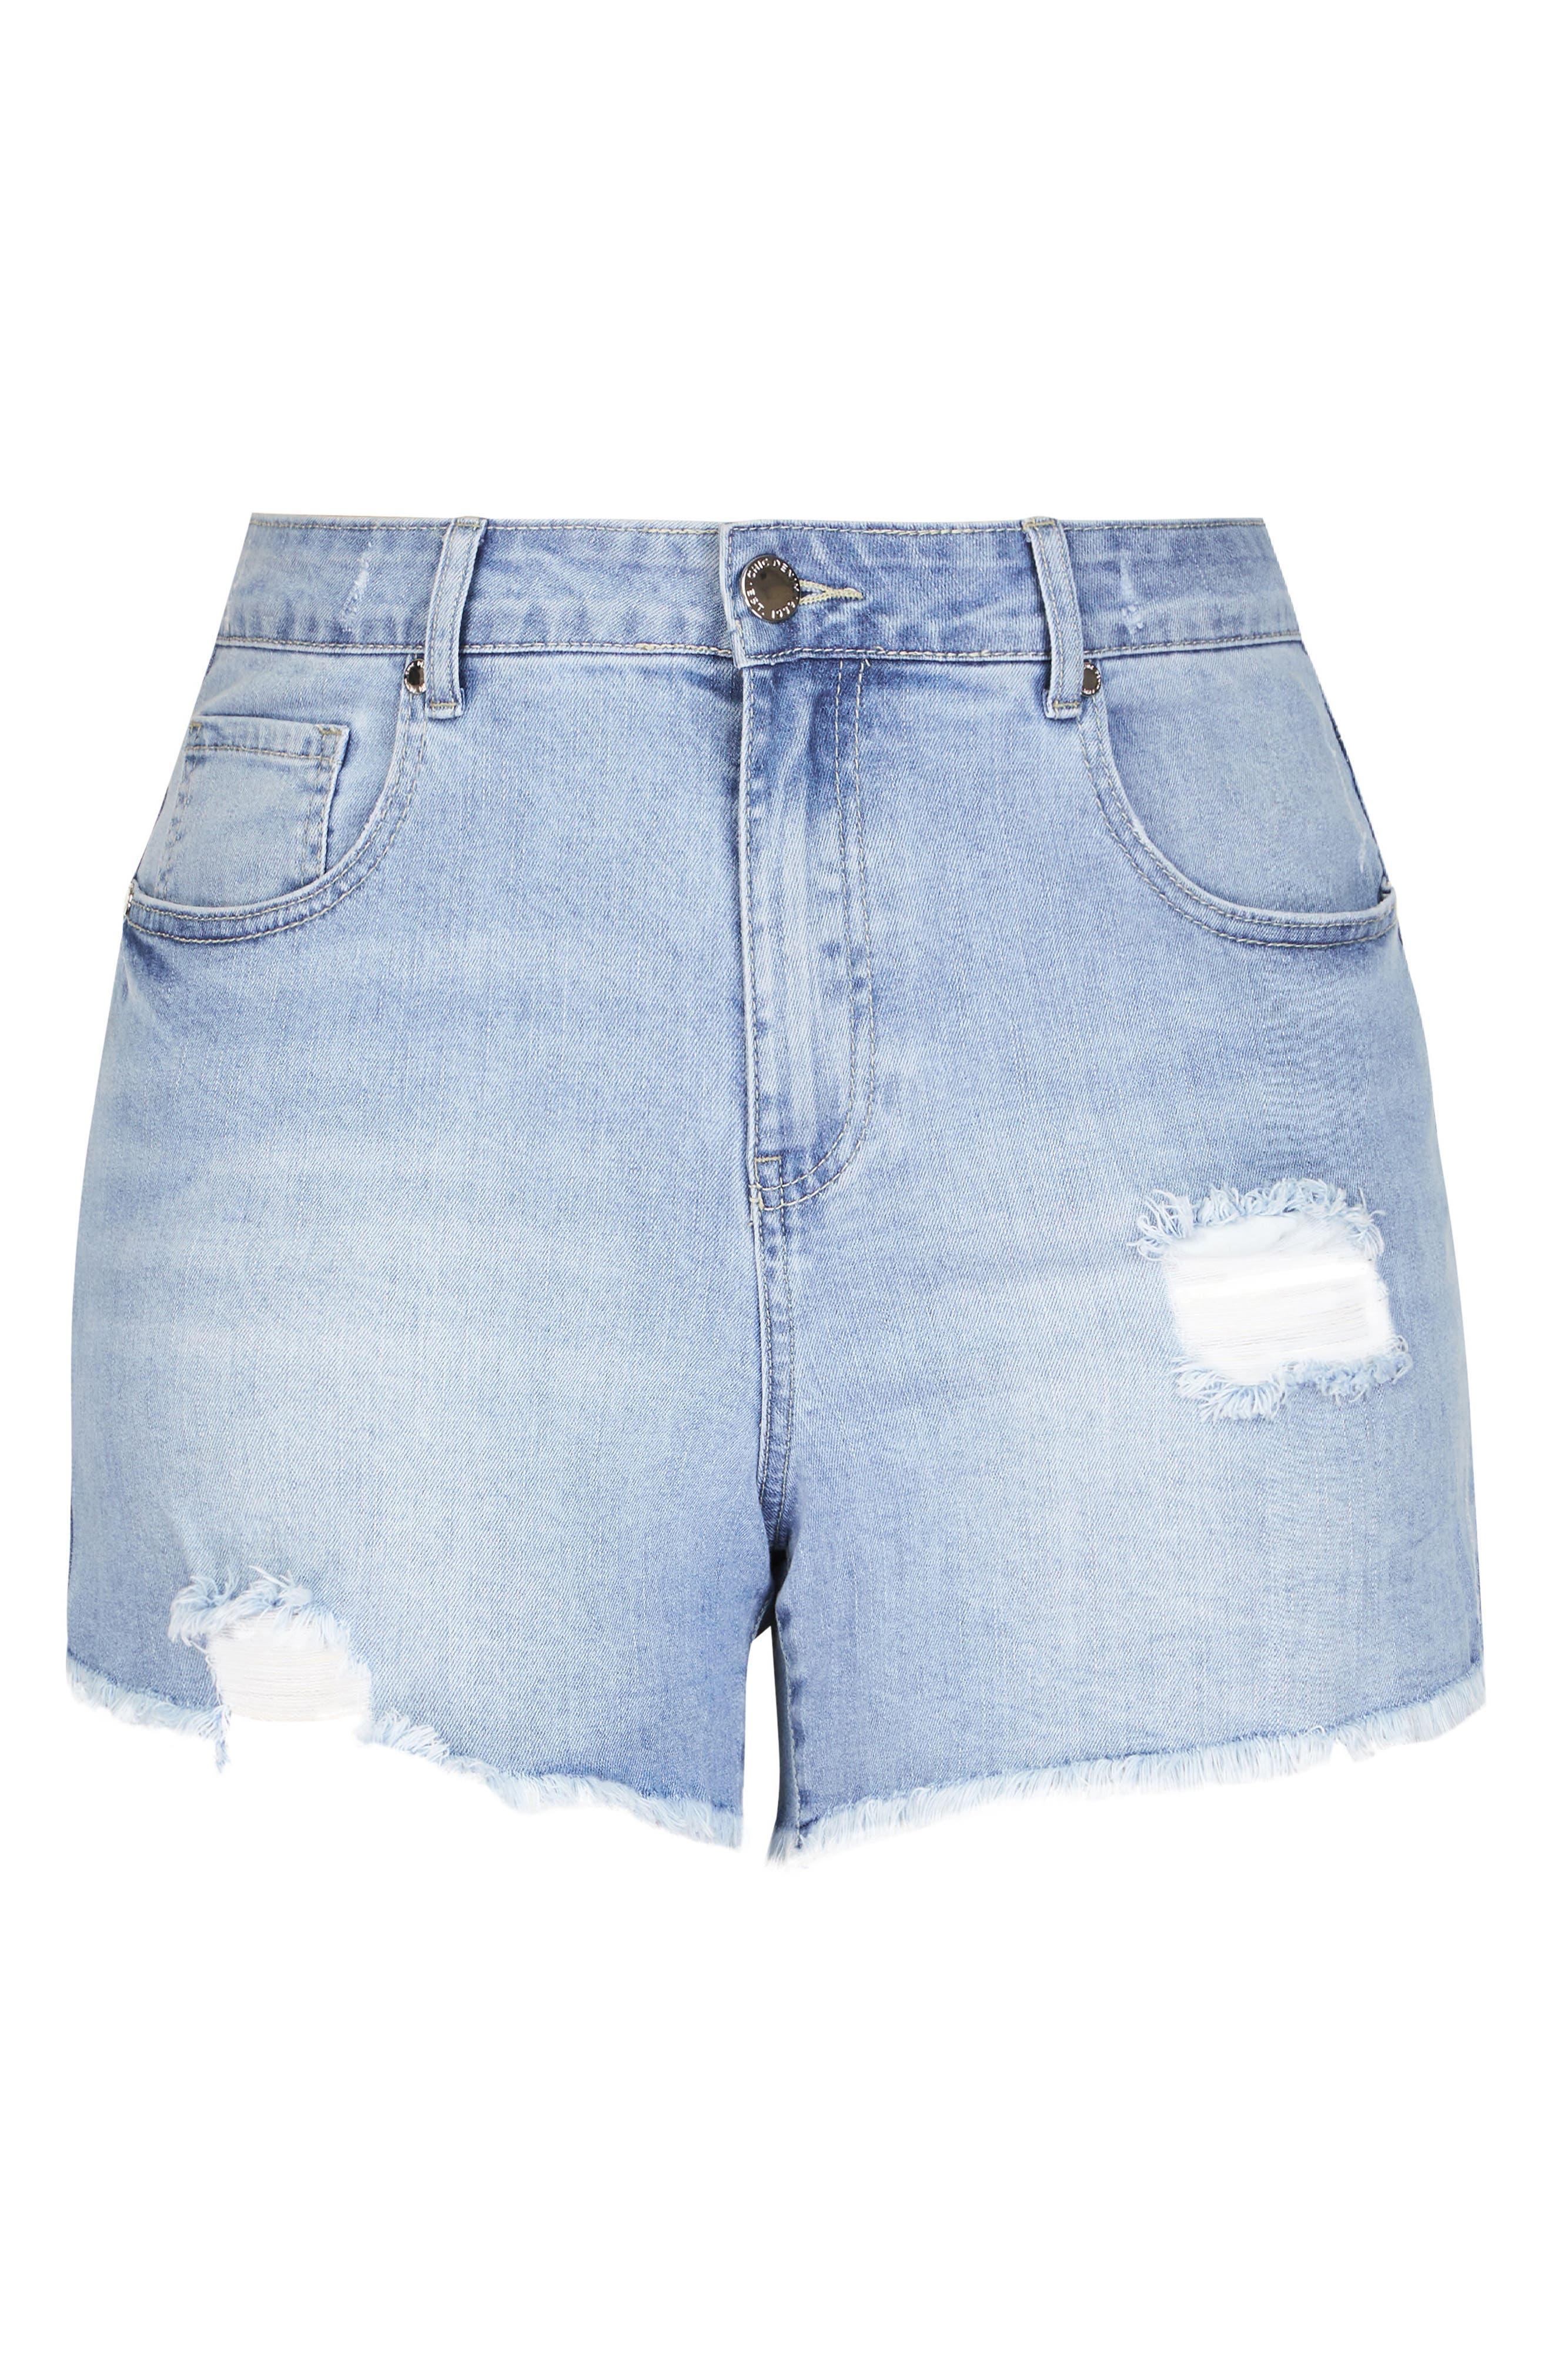 Sweet Cut Out Denim Shorts,                             Alternate thumbnail 3, color,                             LIGHT DENIM